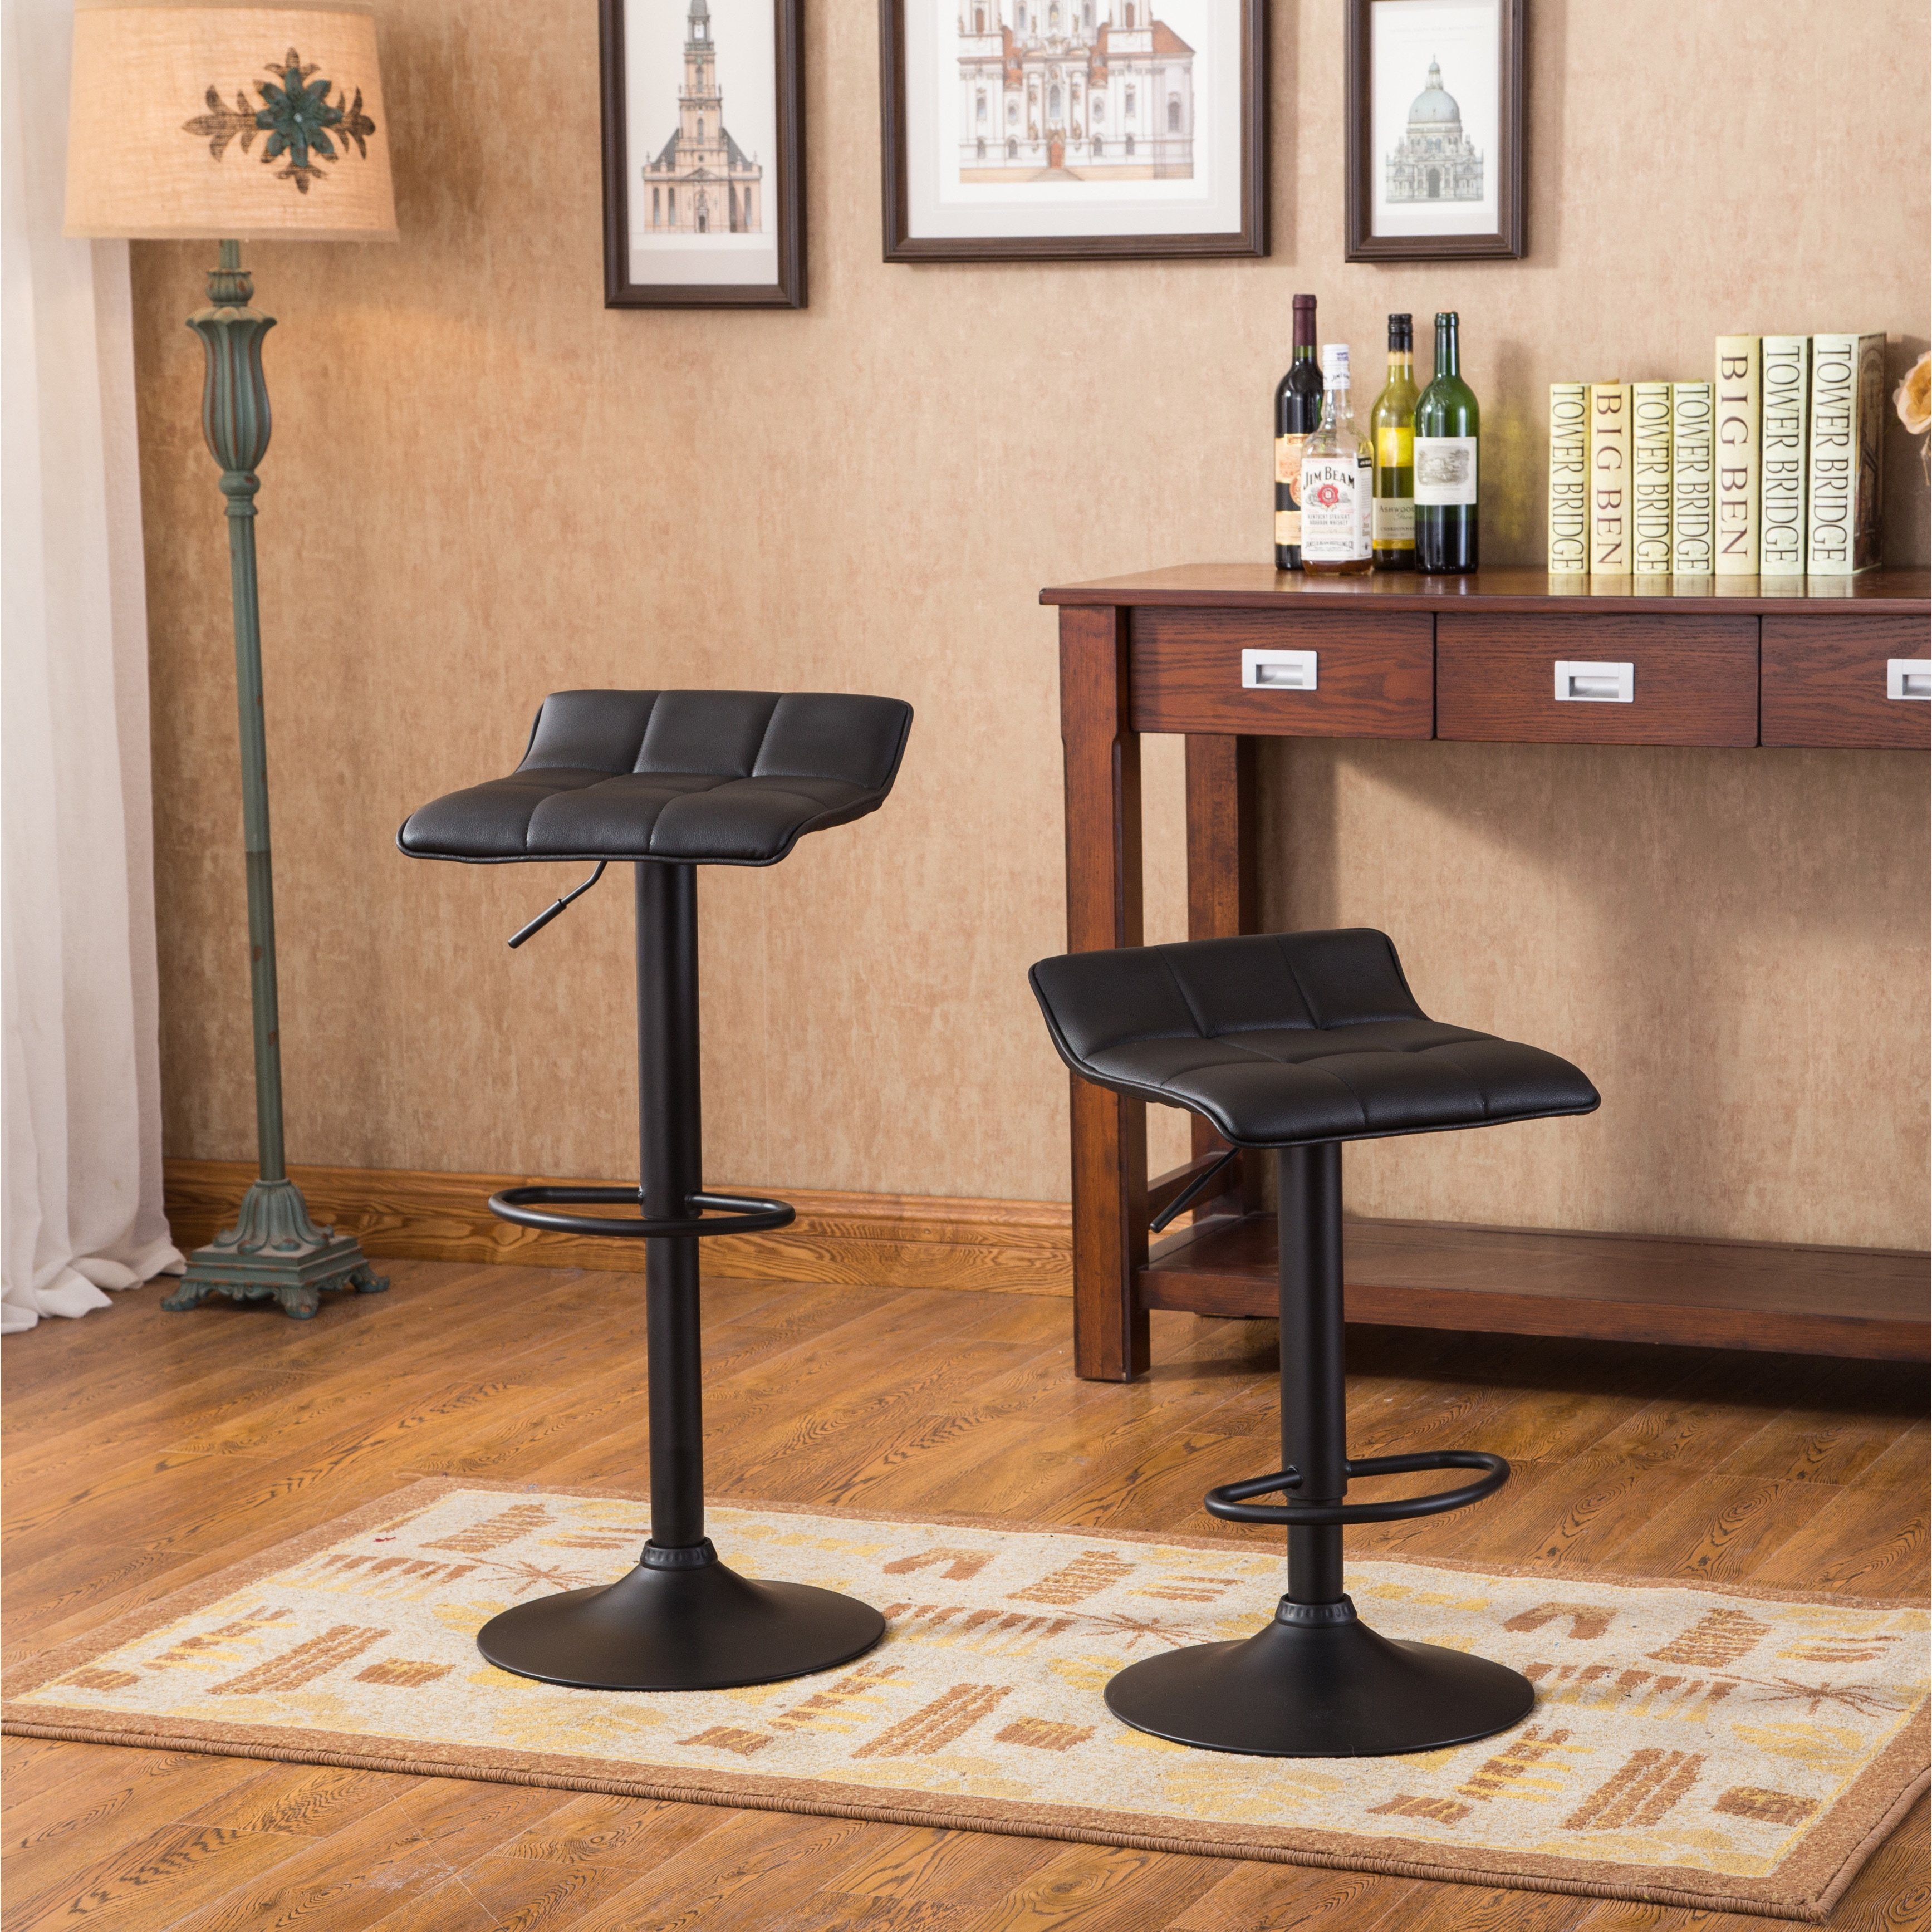 Peachy Belham Swivel Black Bonded Leather Adjustable Bar Stool Set Of 2 Uwap Interior Chair Design Uwaporg